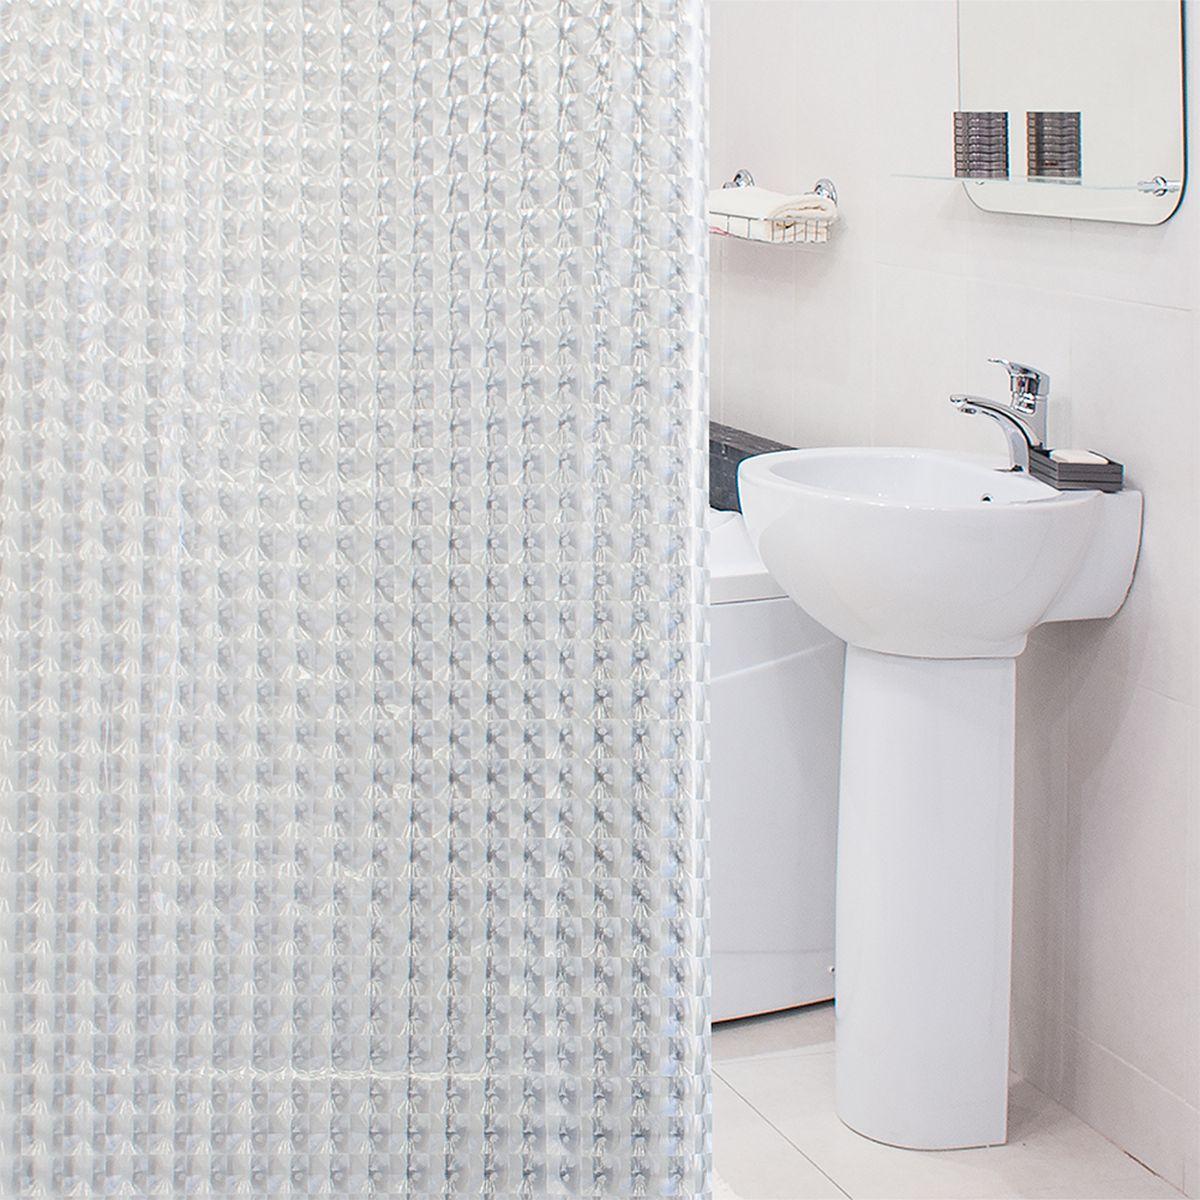 Фото - Штора для ванной комнаты 3D Tatkraft Crystal, с кольцами, 180 х 180 см шторка для ванной tatkraft seagull цвет белый синий 180 см х 180 см